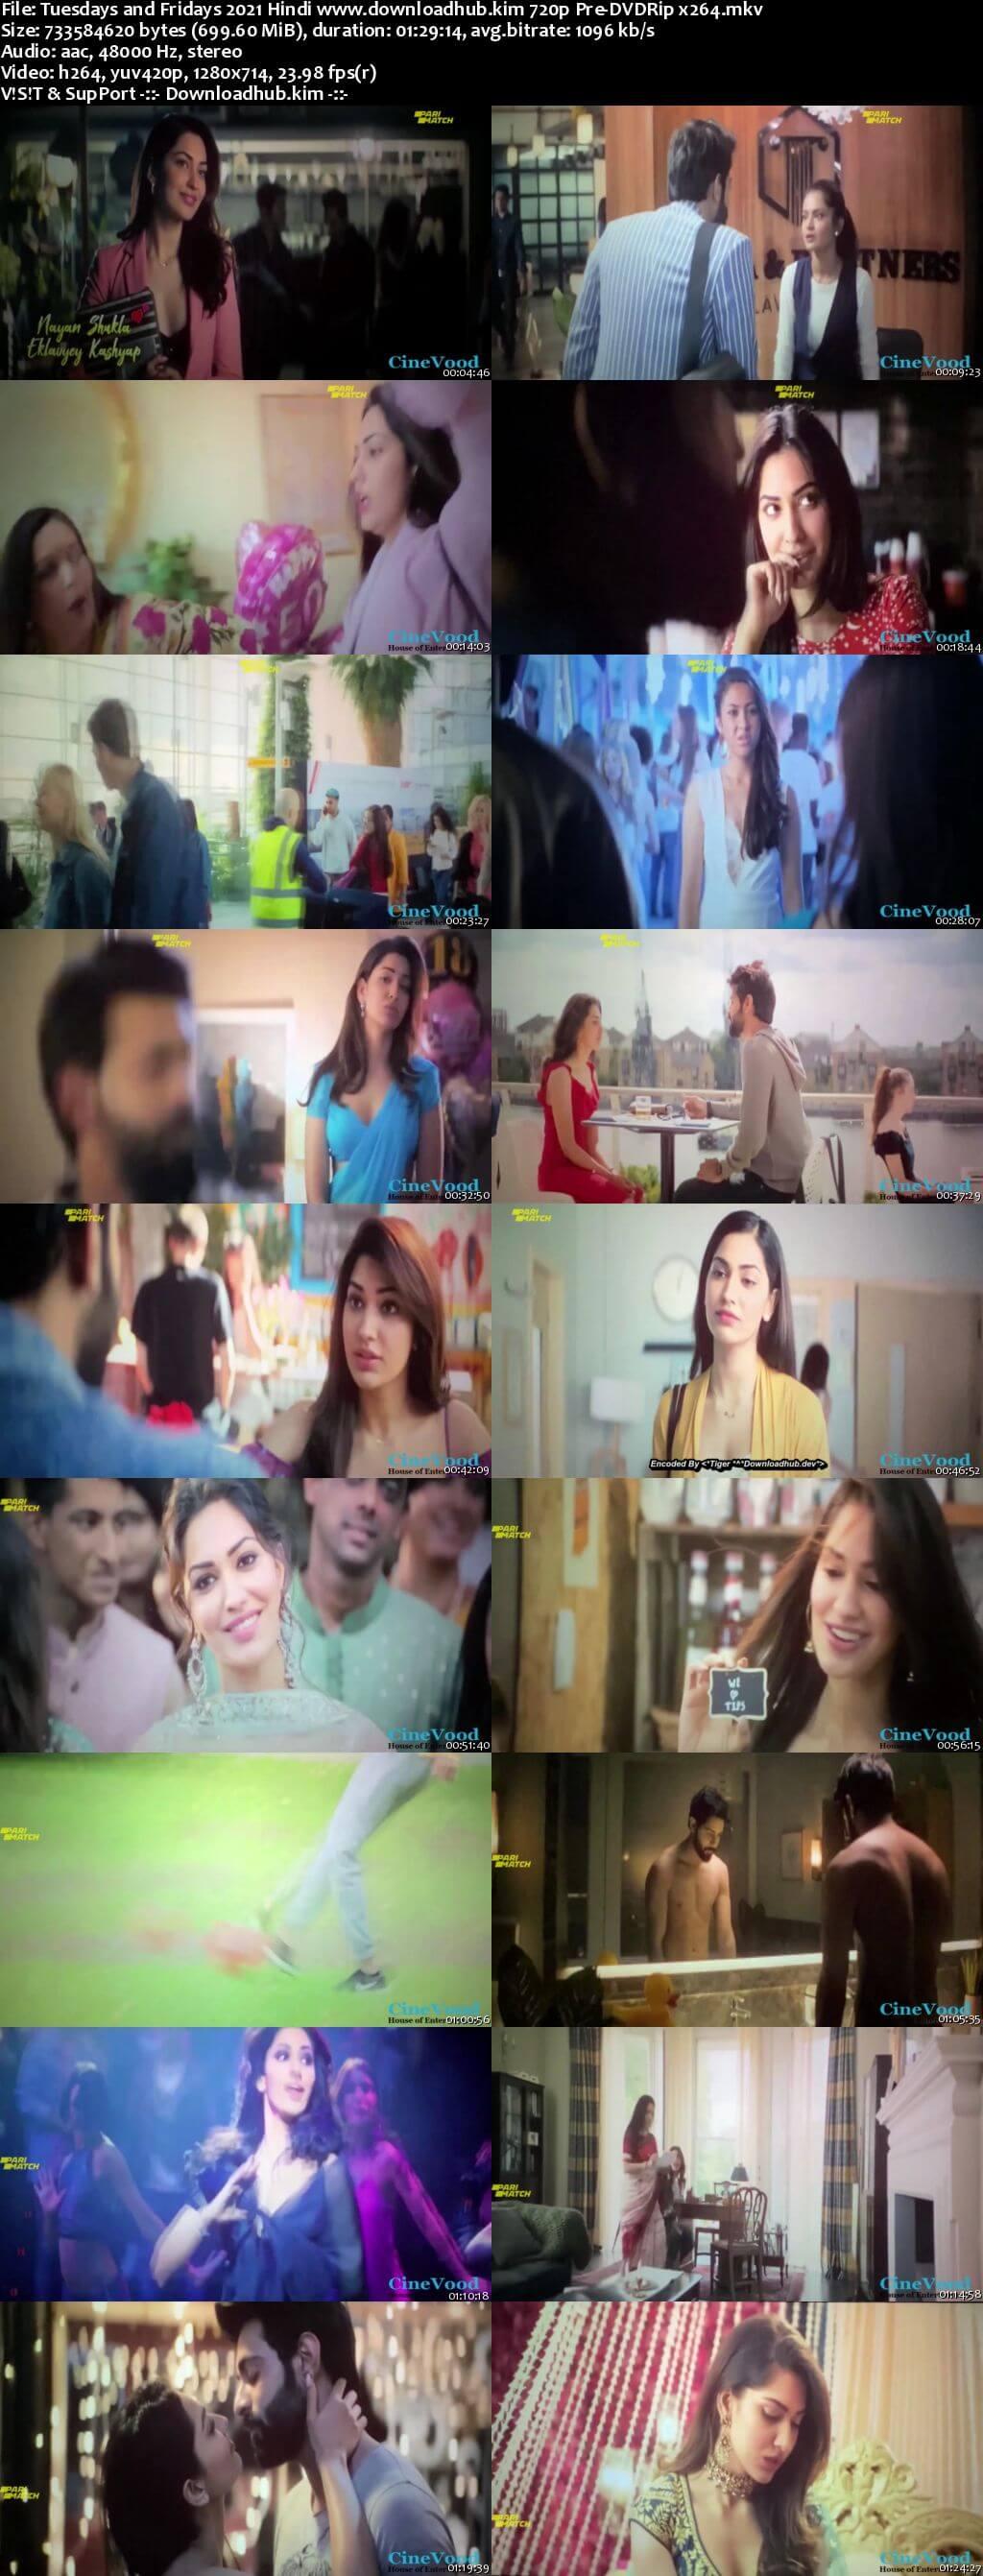 Tuesdays and Fridays 2021 Hindi 720p 480p Pre-DVDRip x264